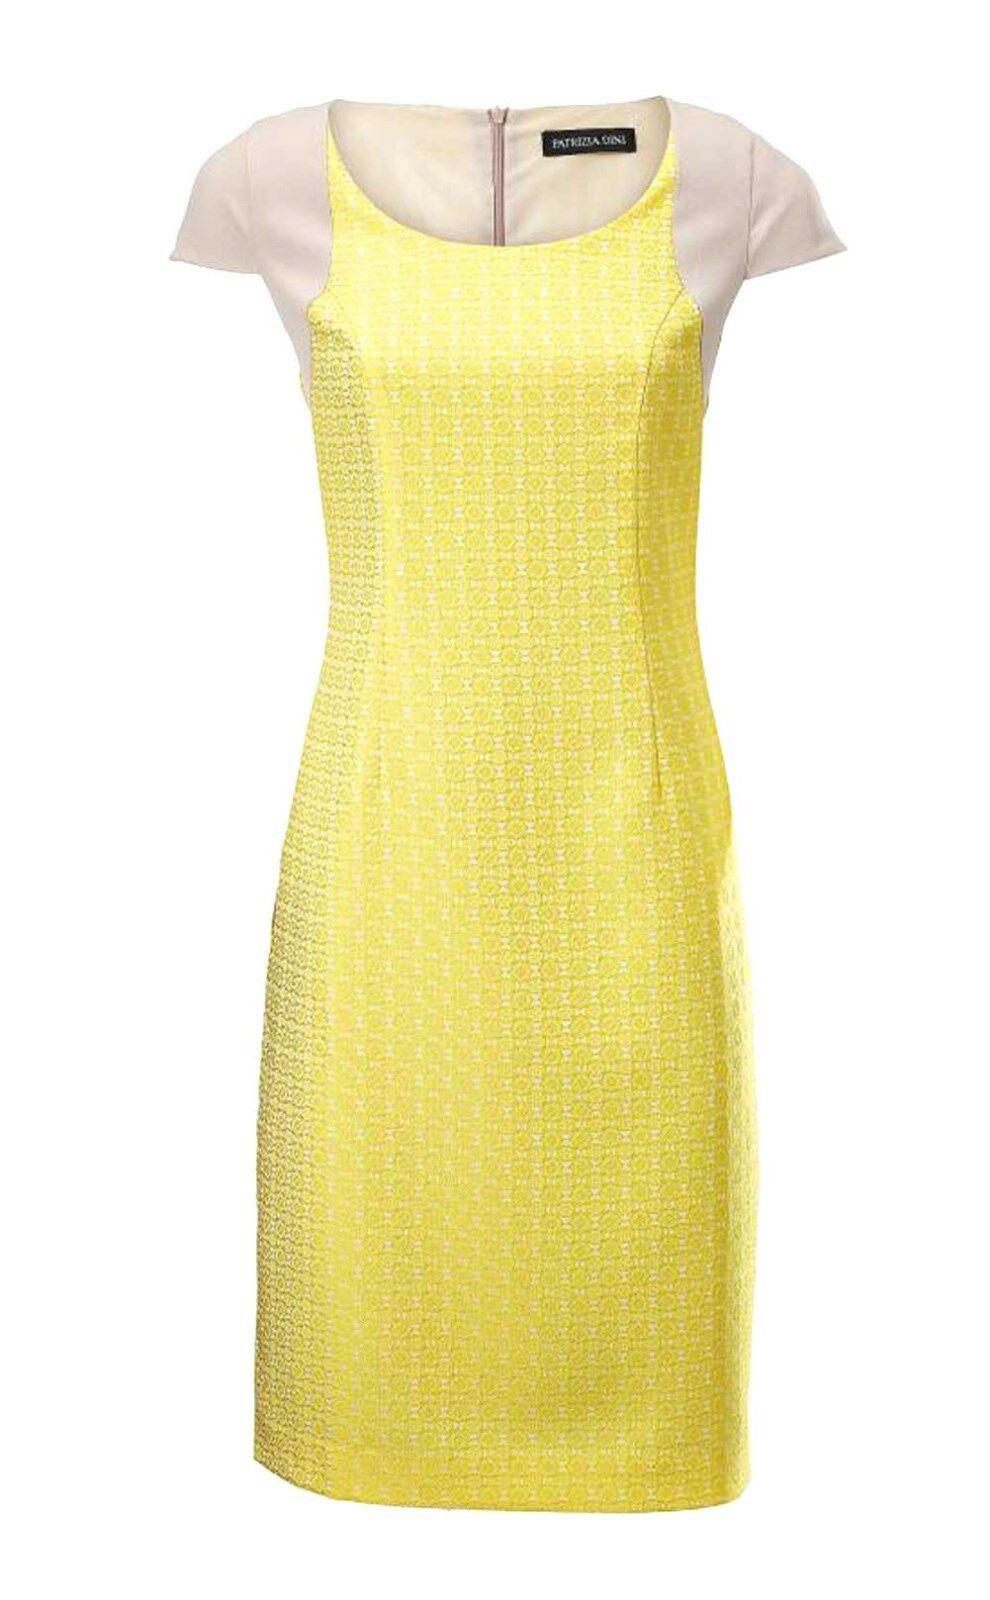 TCJ 002.609 Kleid Jacquardkleid Abendkleid Sommerkleid Freizeitkleid gelb